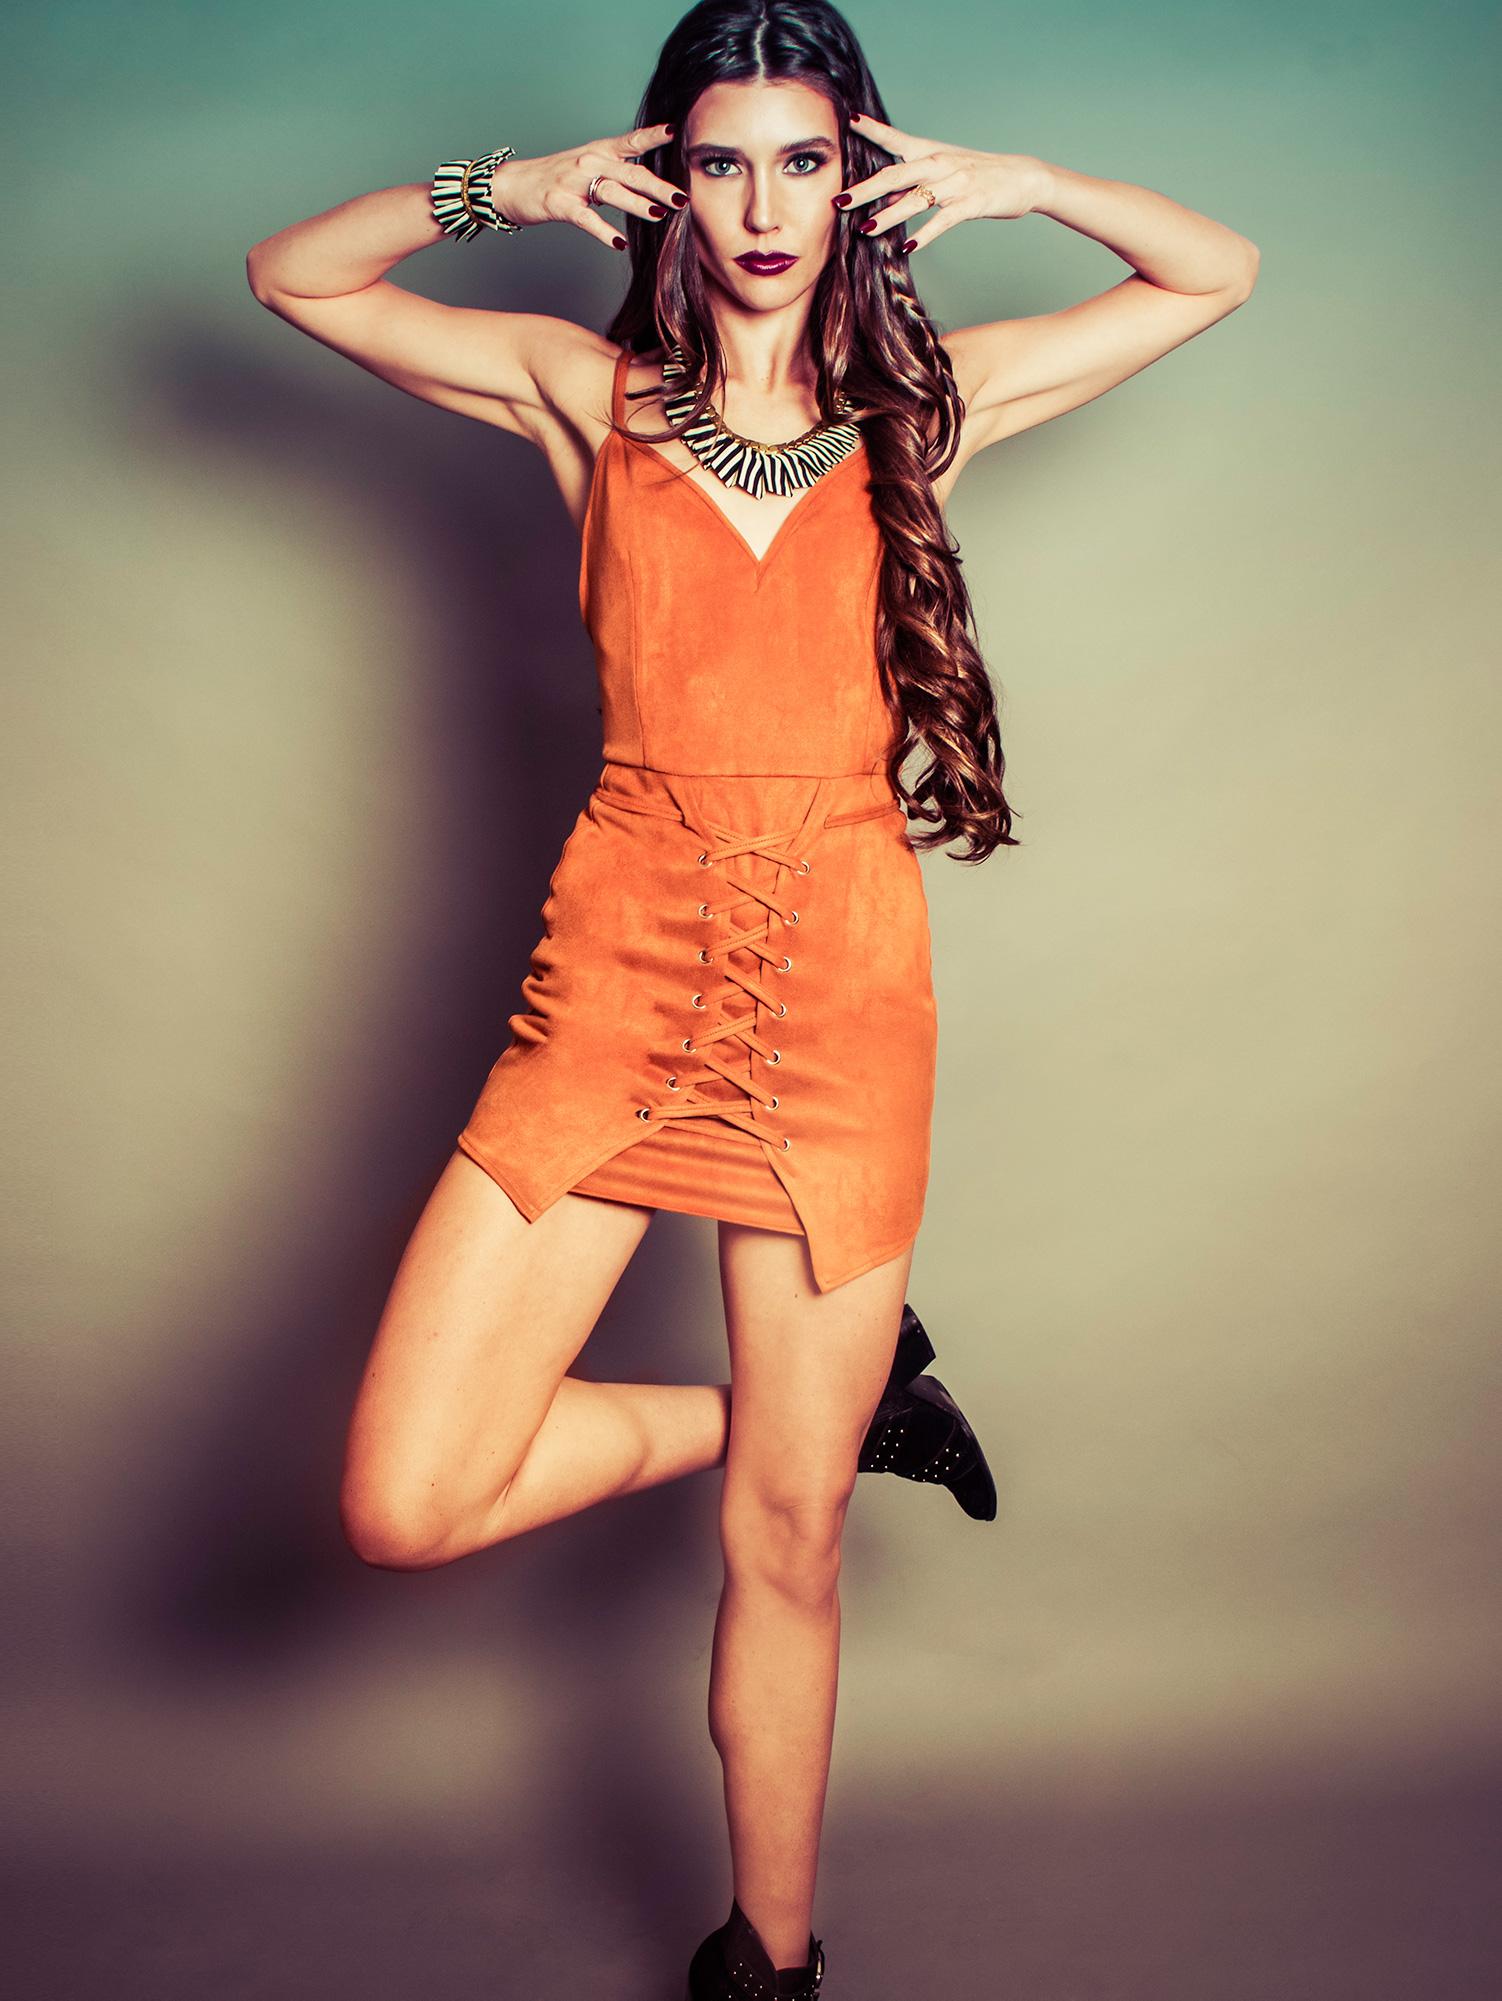 amora_beauty_studio_fashion_female_model_indie_orange_dress_miami.jpg